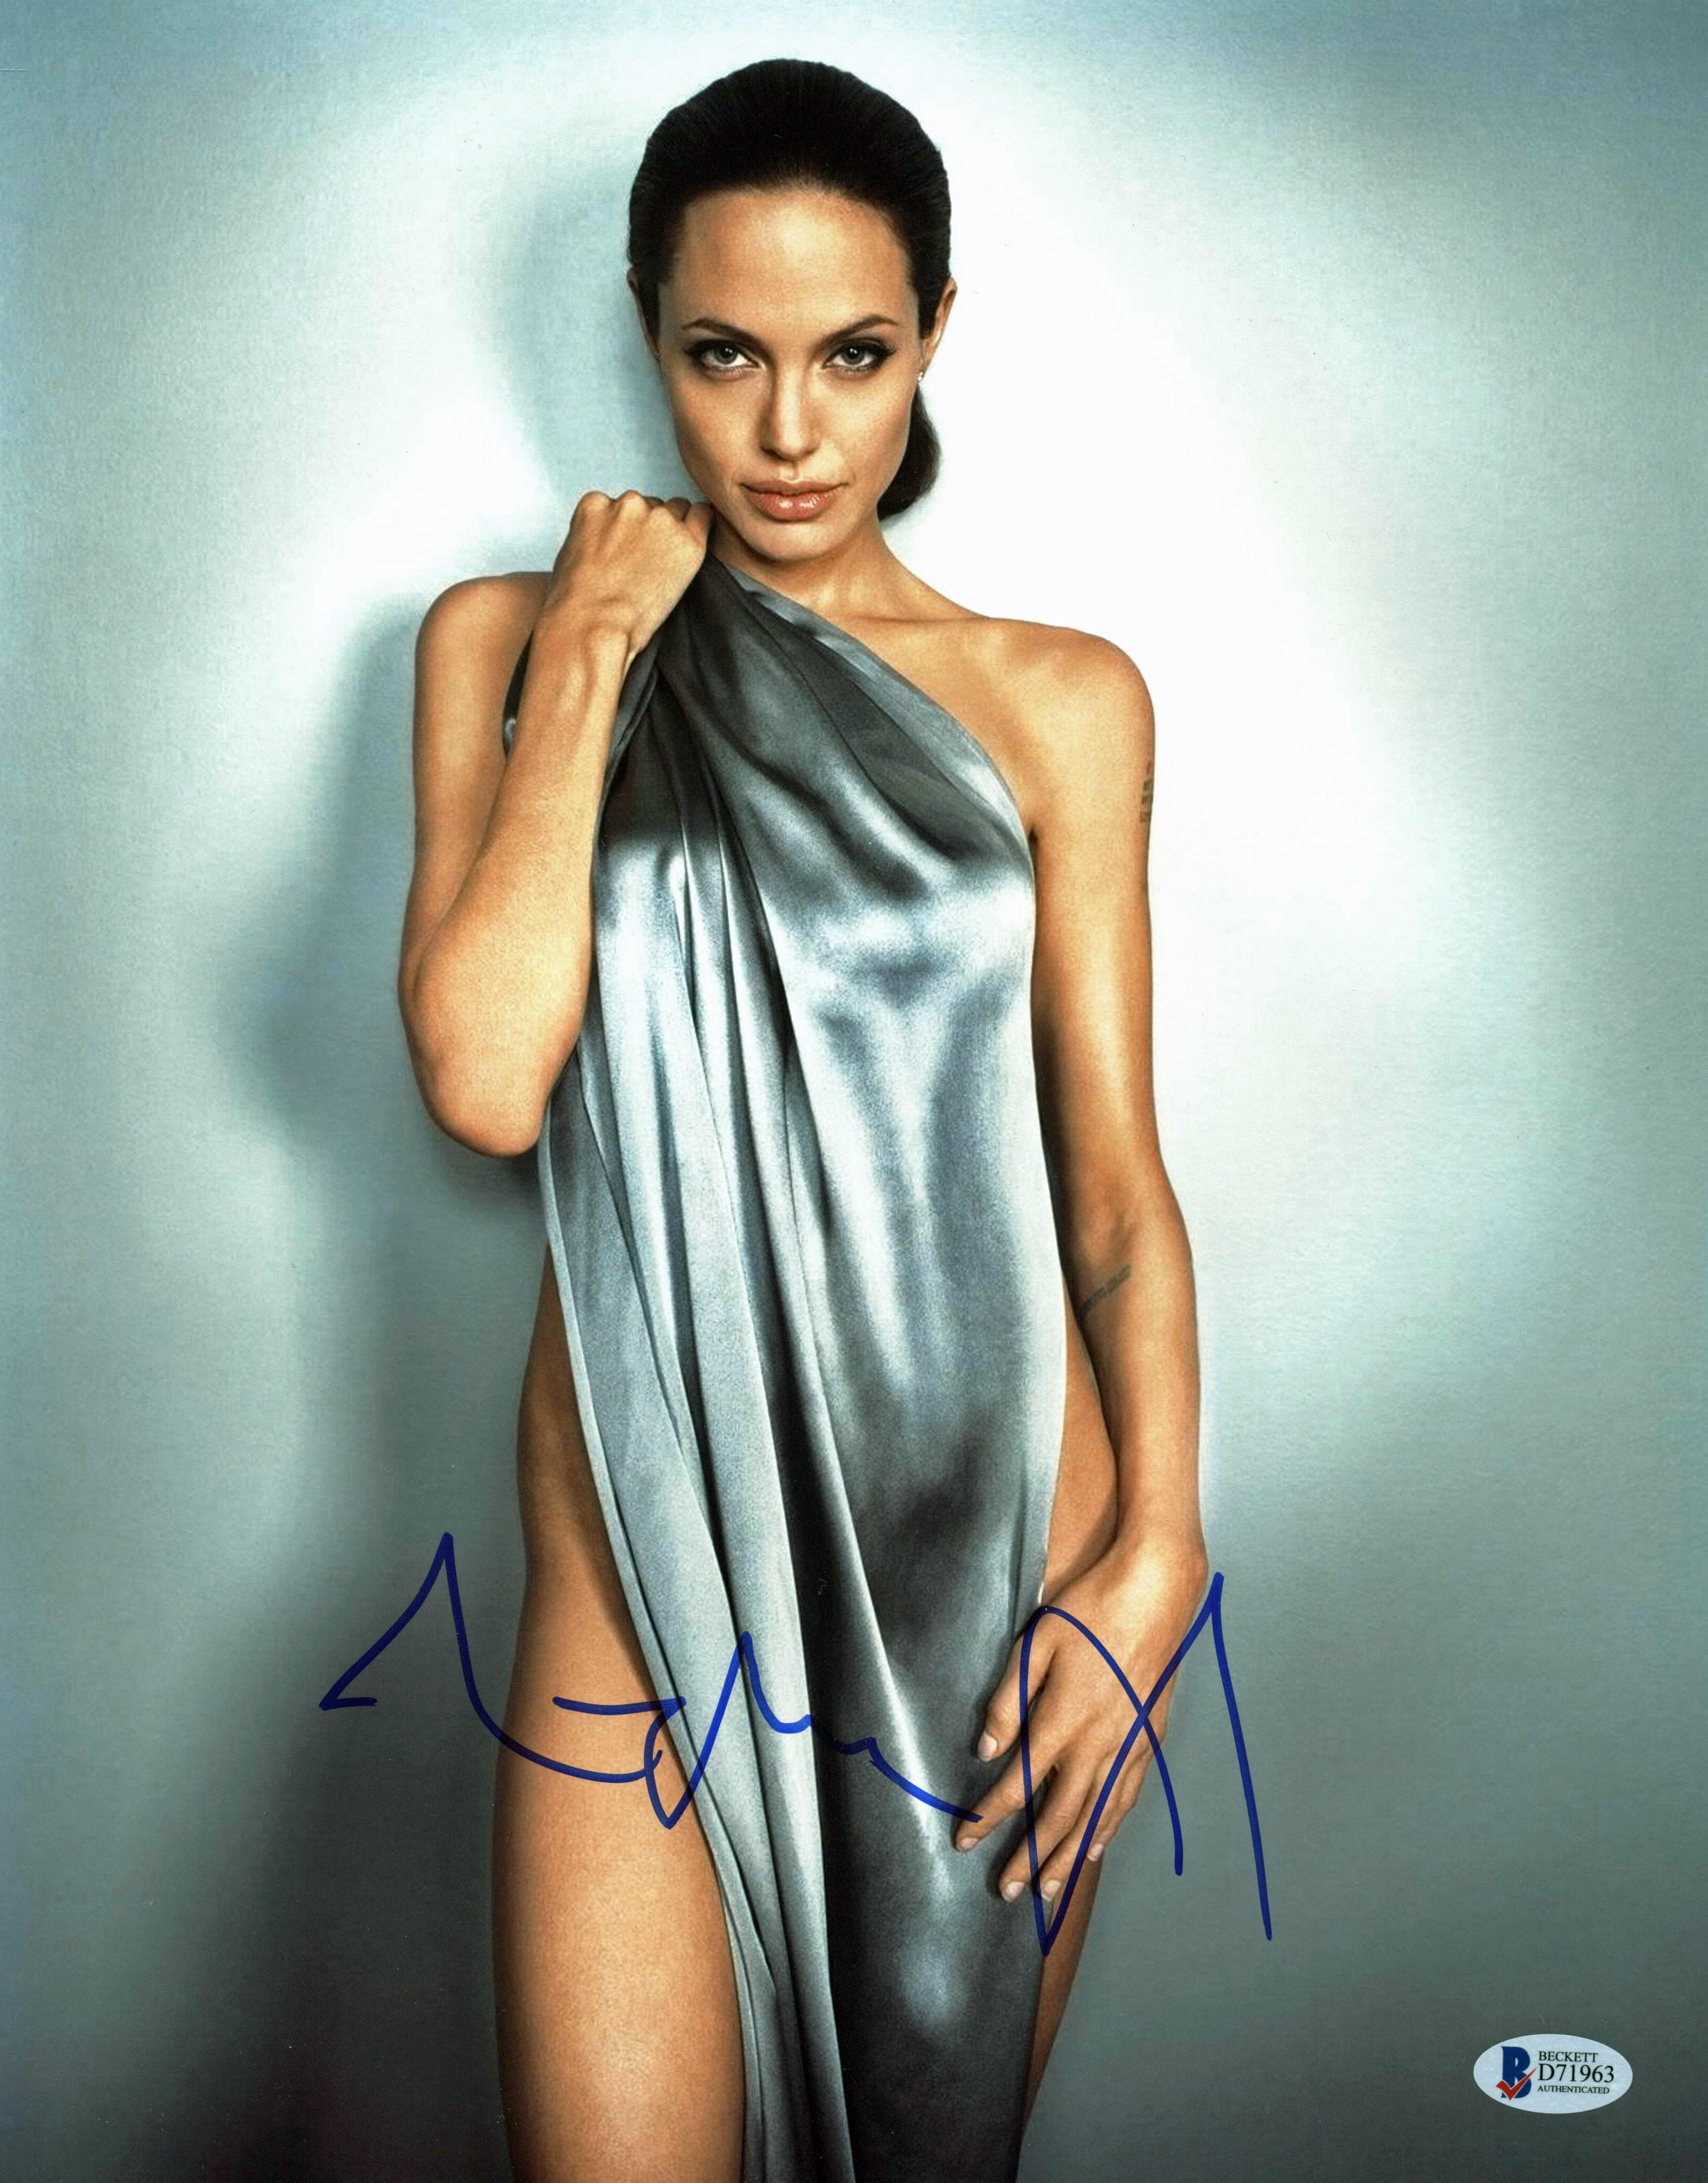 Angelina Jolie Sexi Movie $164.99 - angelina jolie sexy authentic signed 11x14 photo